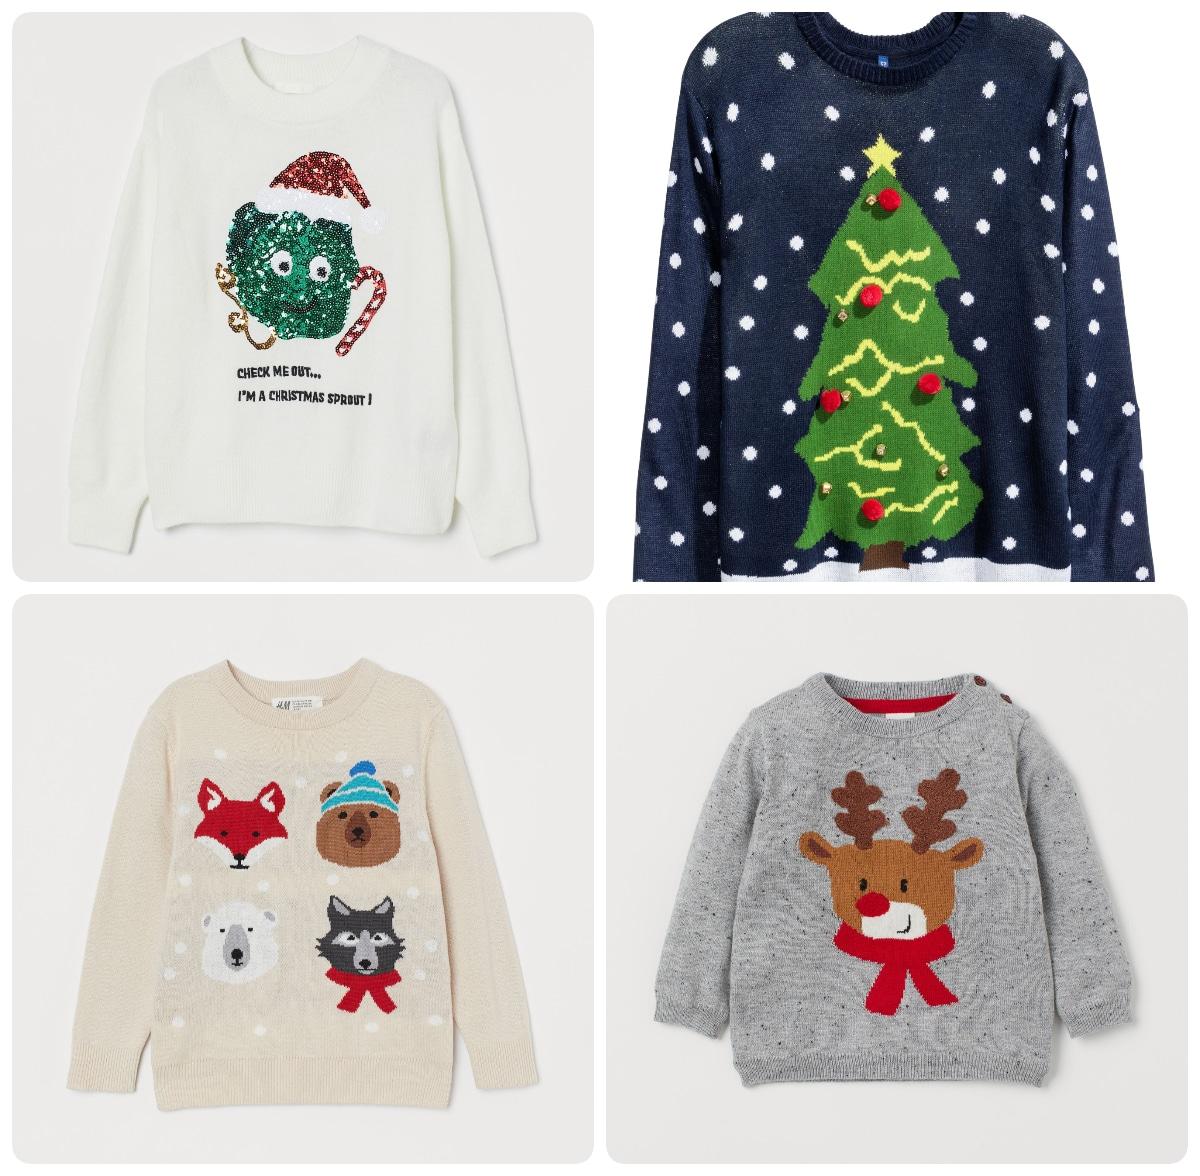 Jerséis navideños para toda la familia